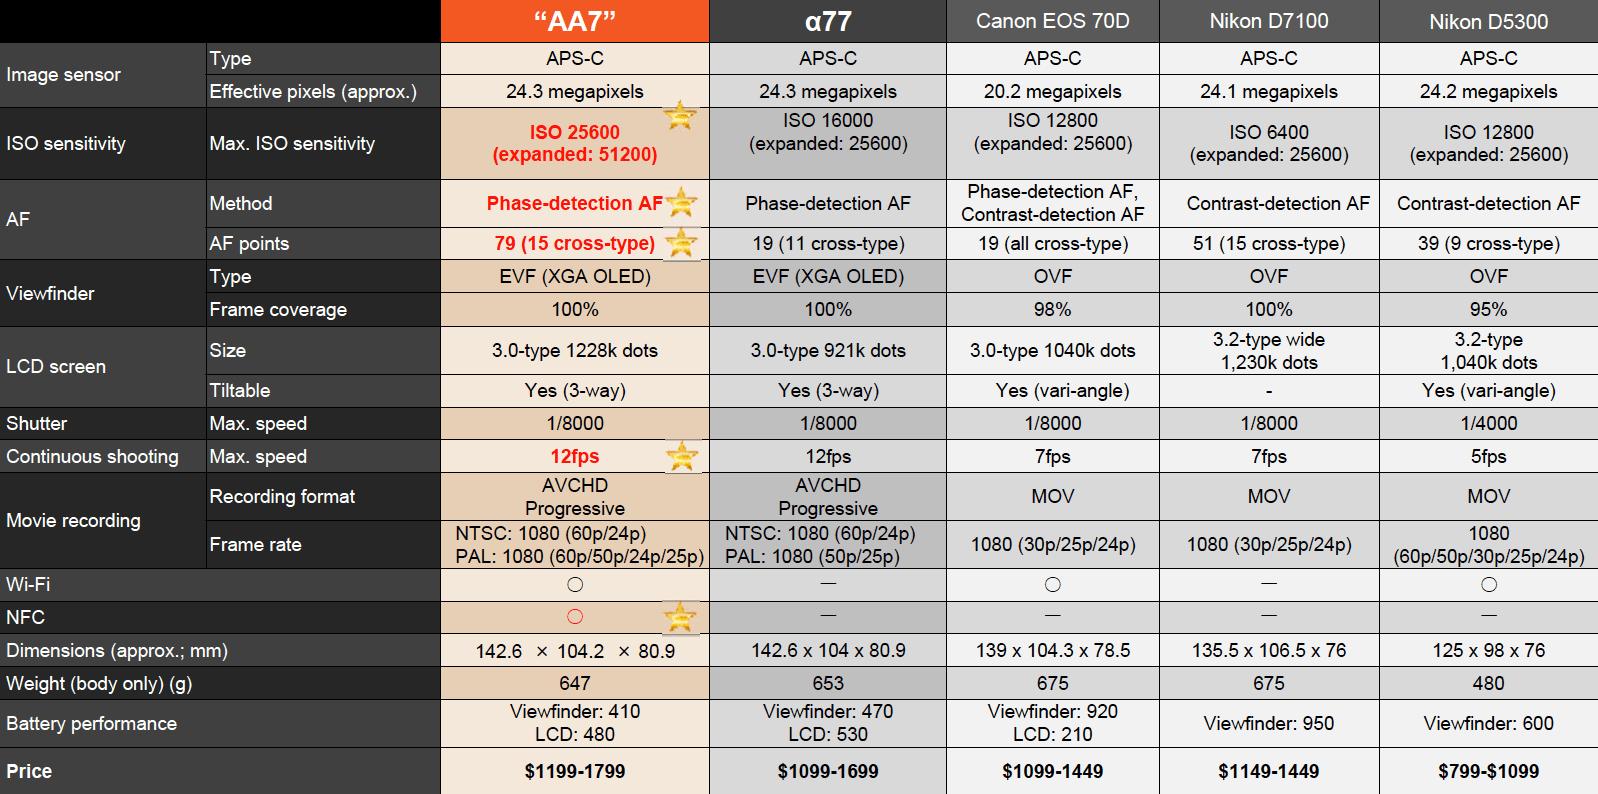 Sony-17M2-specs-comparison